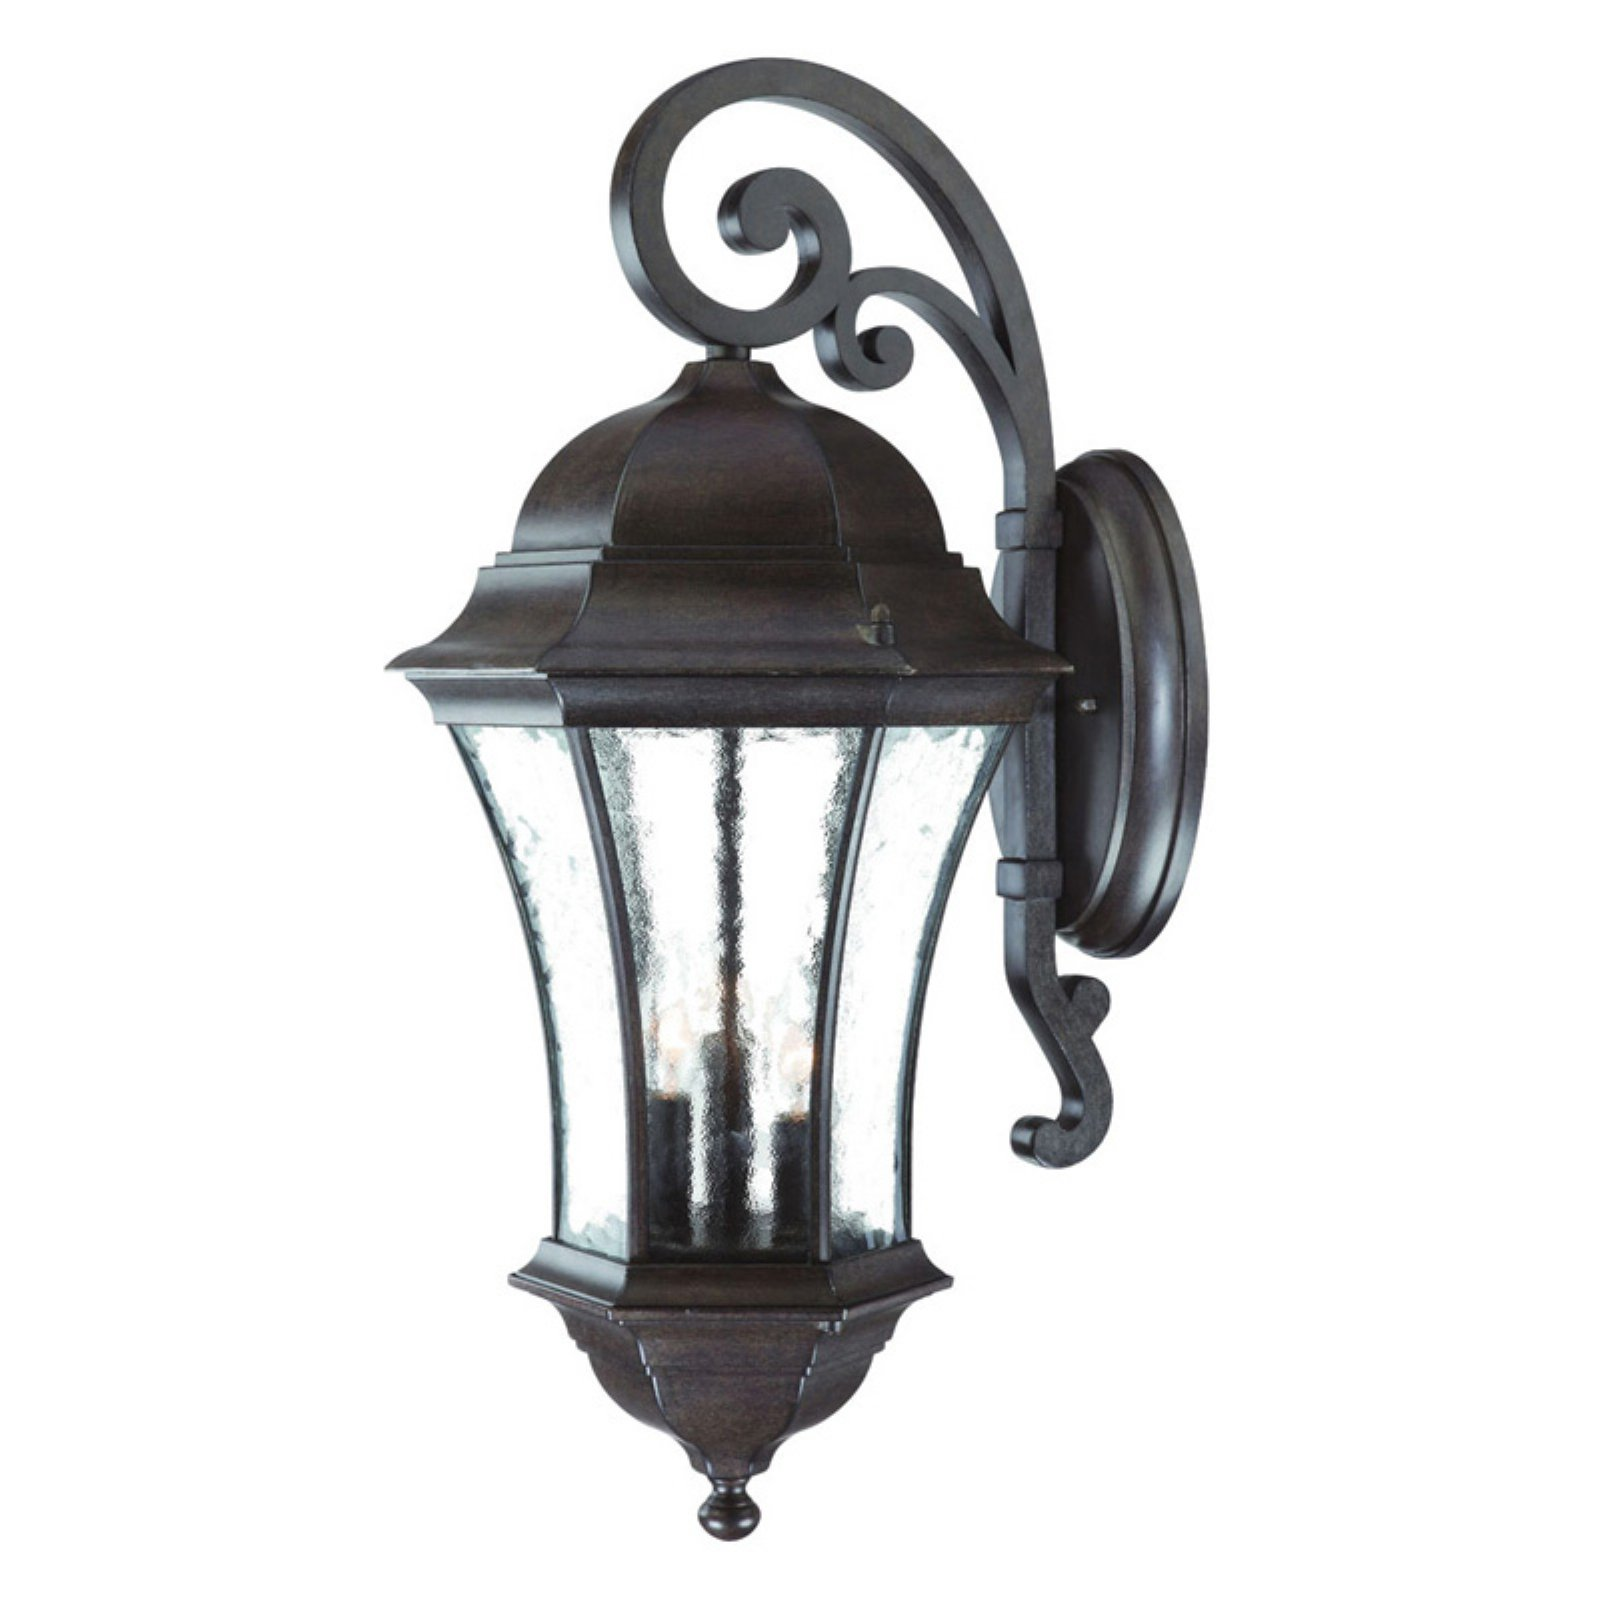 Acclaim Lighting Waverly 12.5 in. 3 Light Outdoor Wall Mount Light Fixture